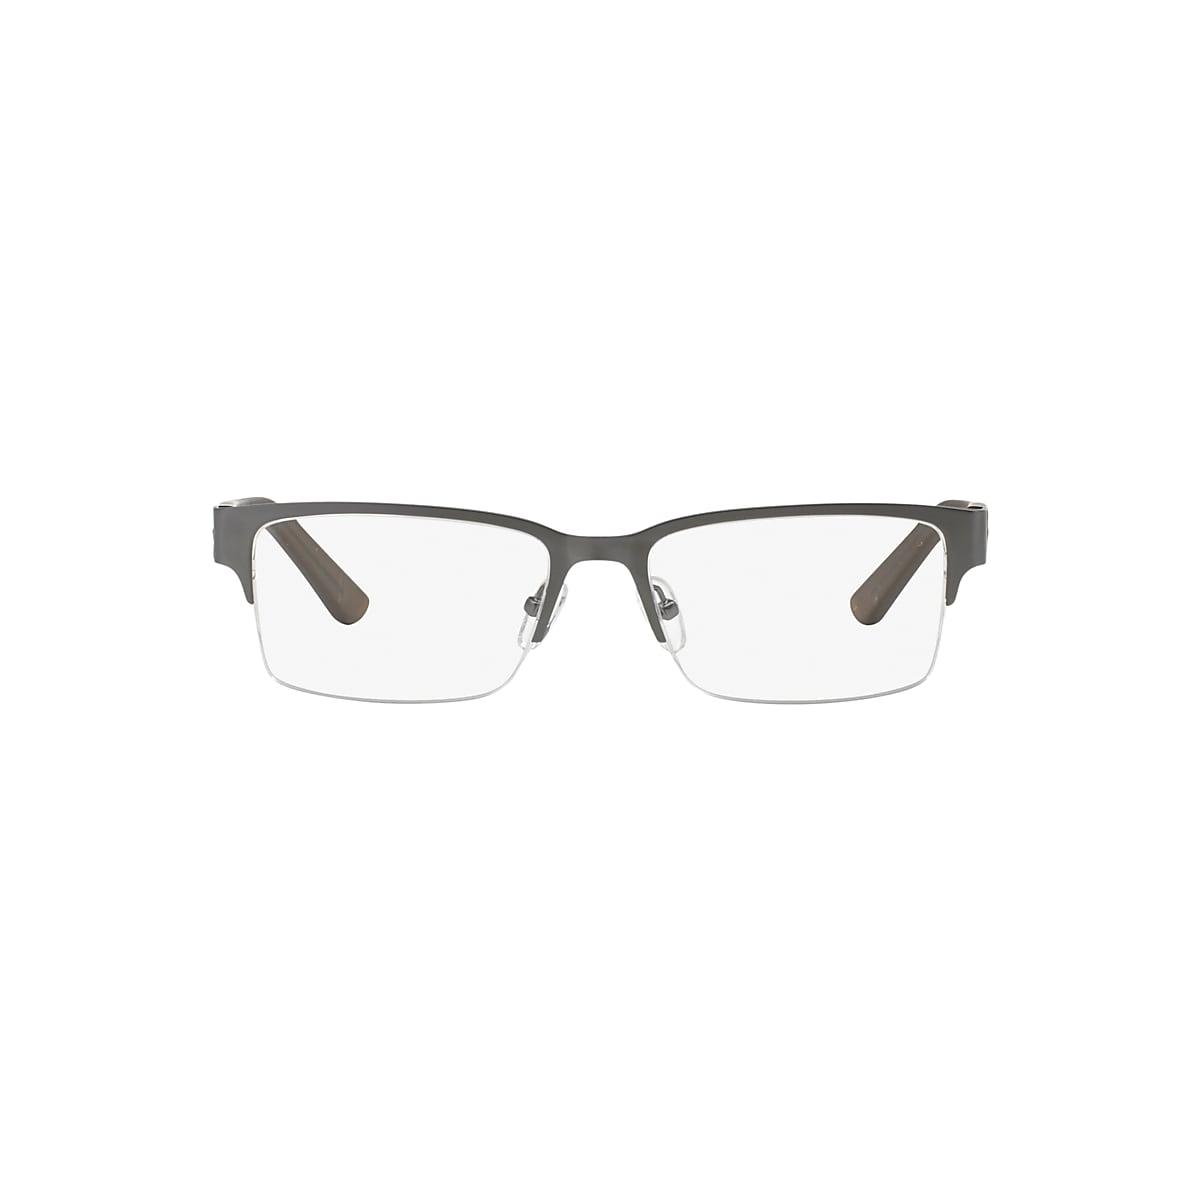 Armani Exchange Ax1014 Eyeglasses Lenscrafters